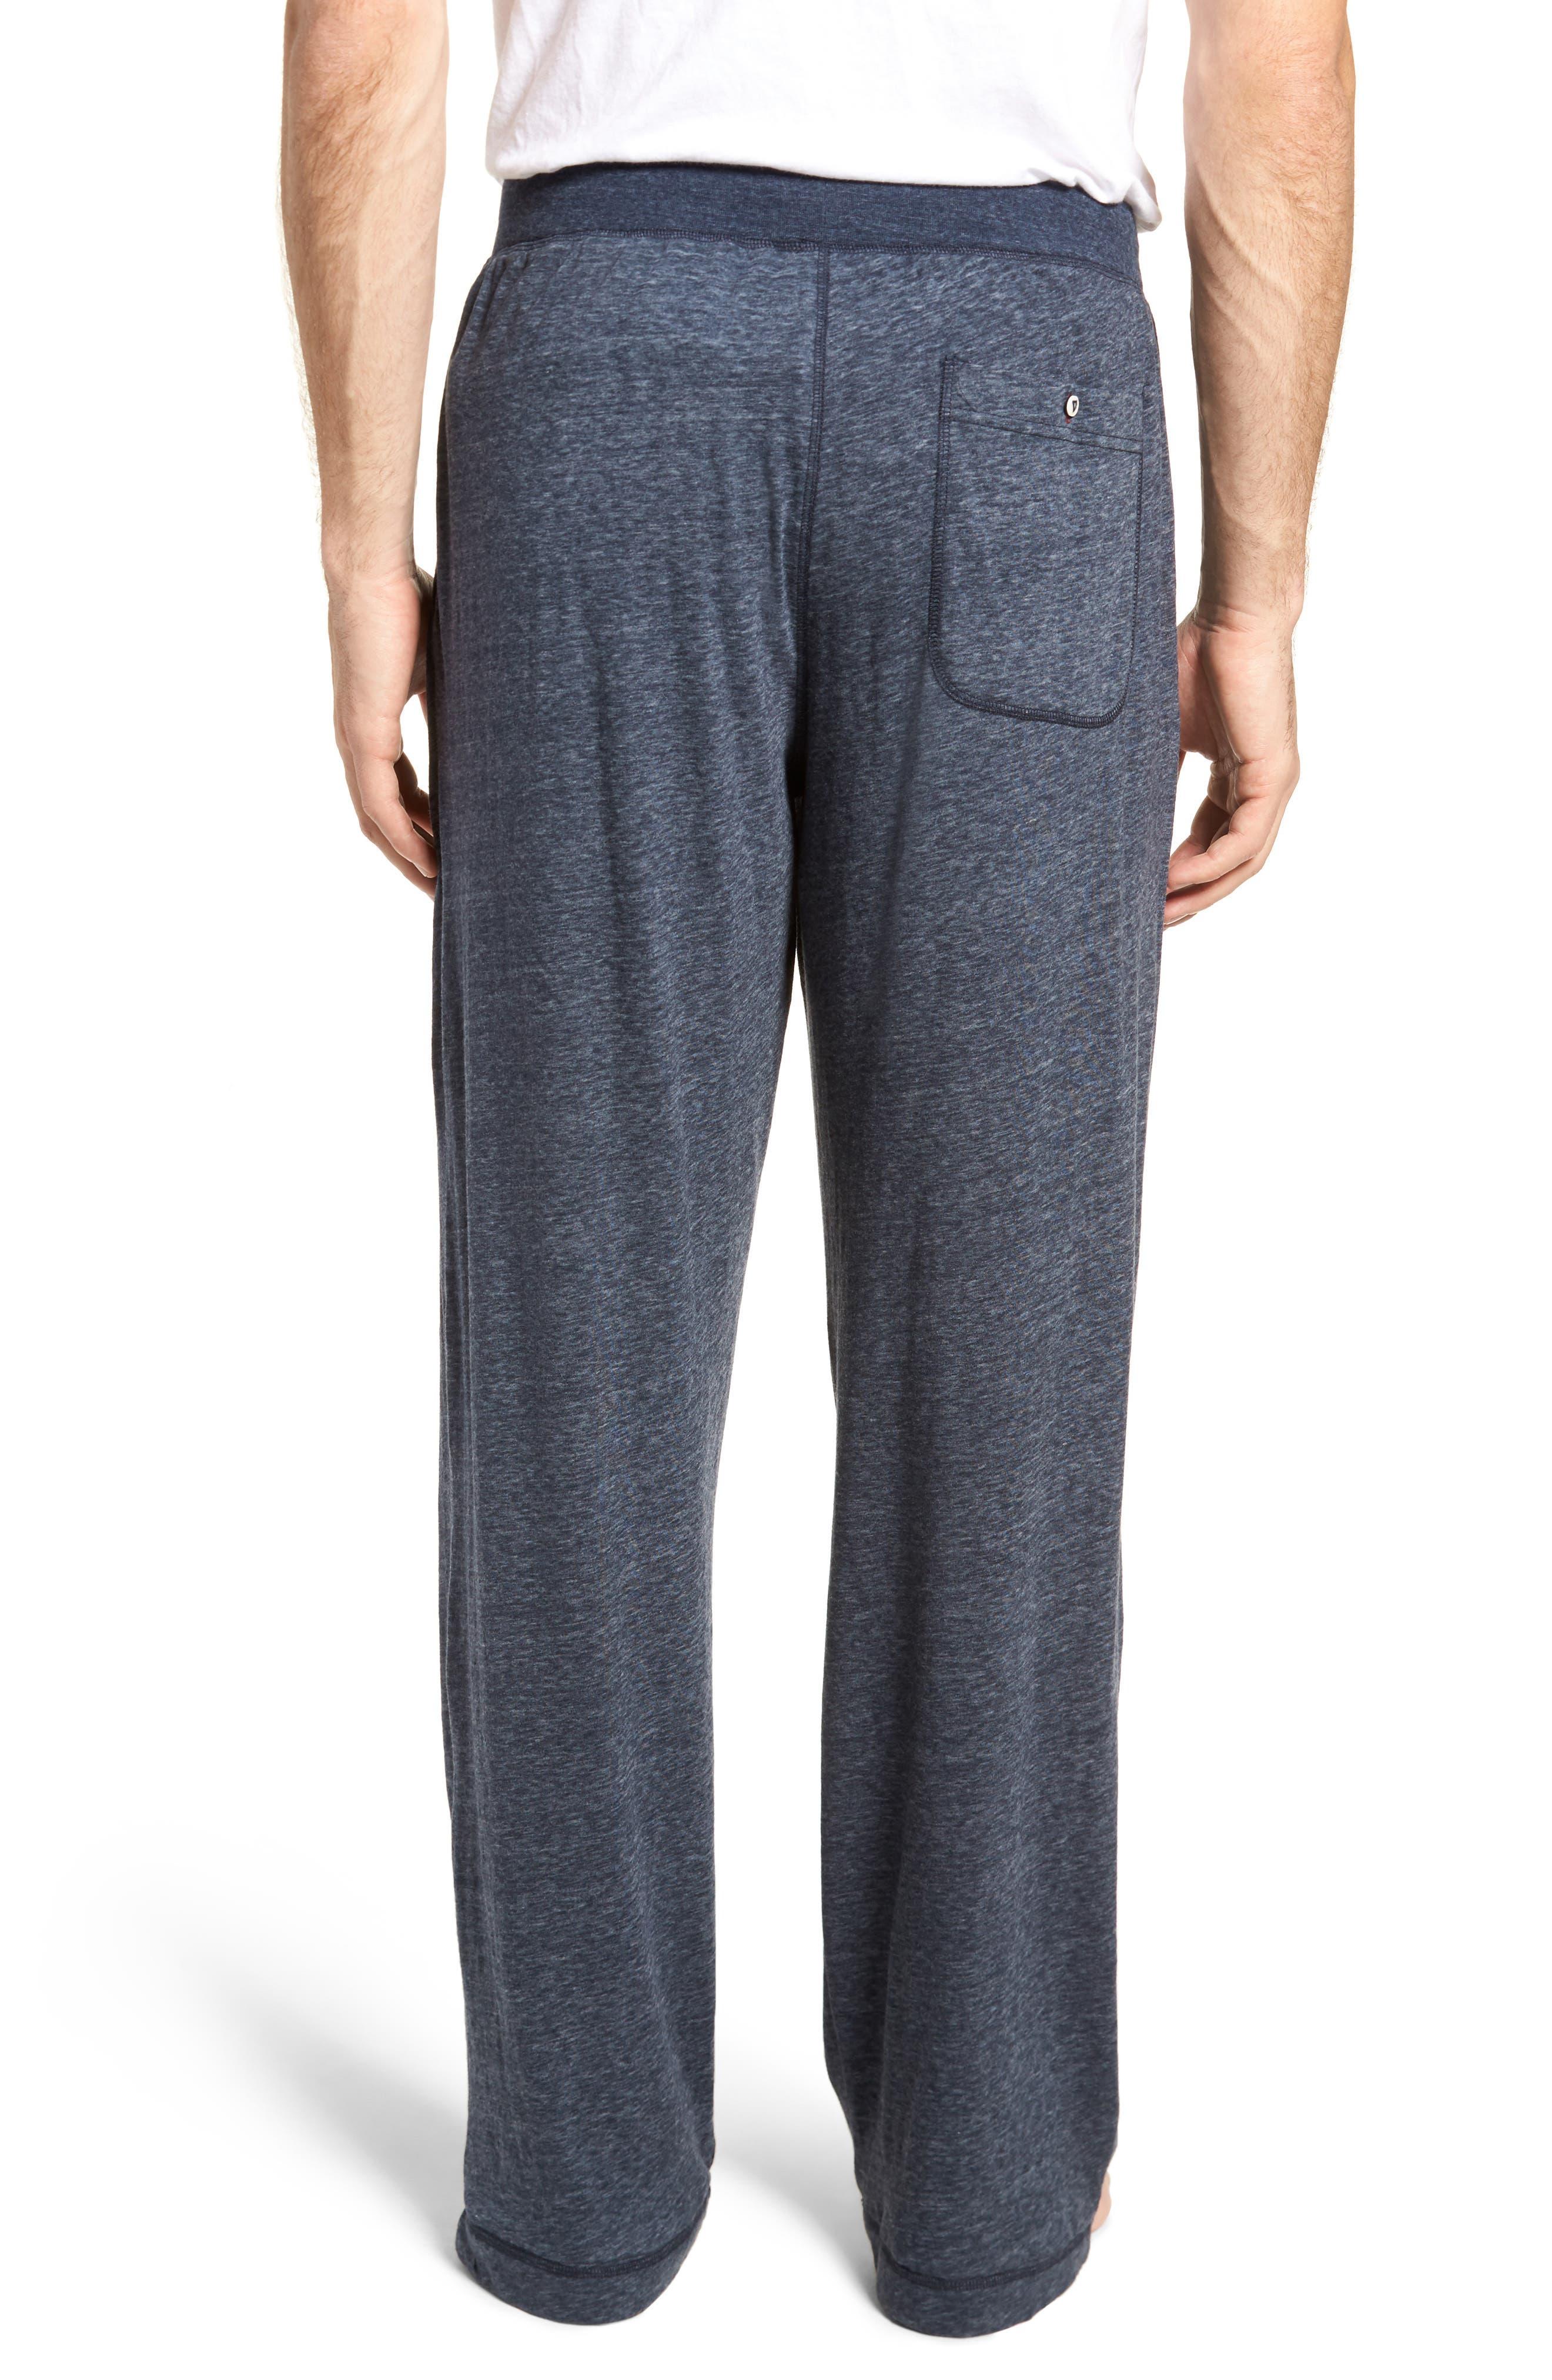 Alternate Image 2  - Daniel Buchler Recycled Cotton Blend Lounge Pants